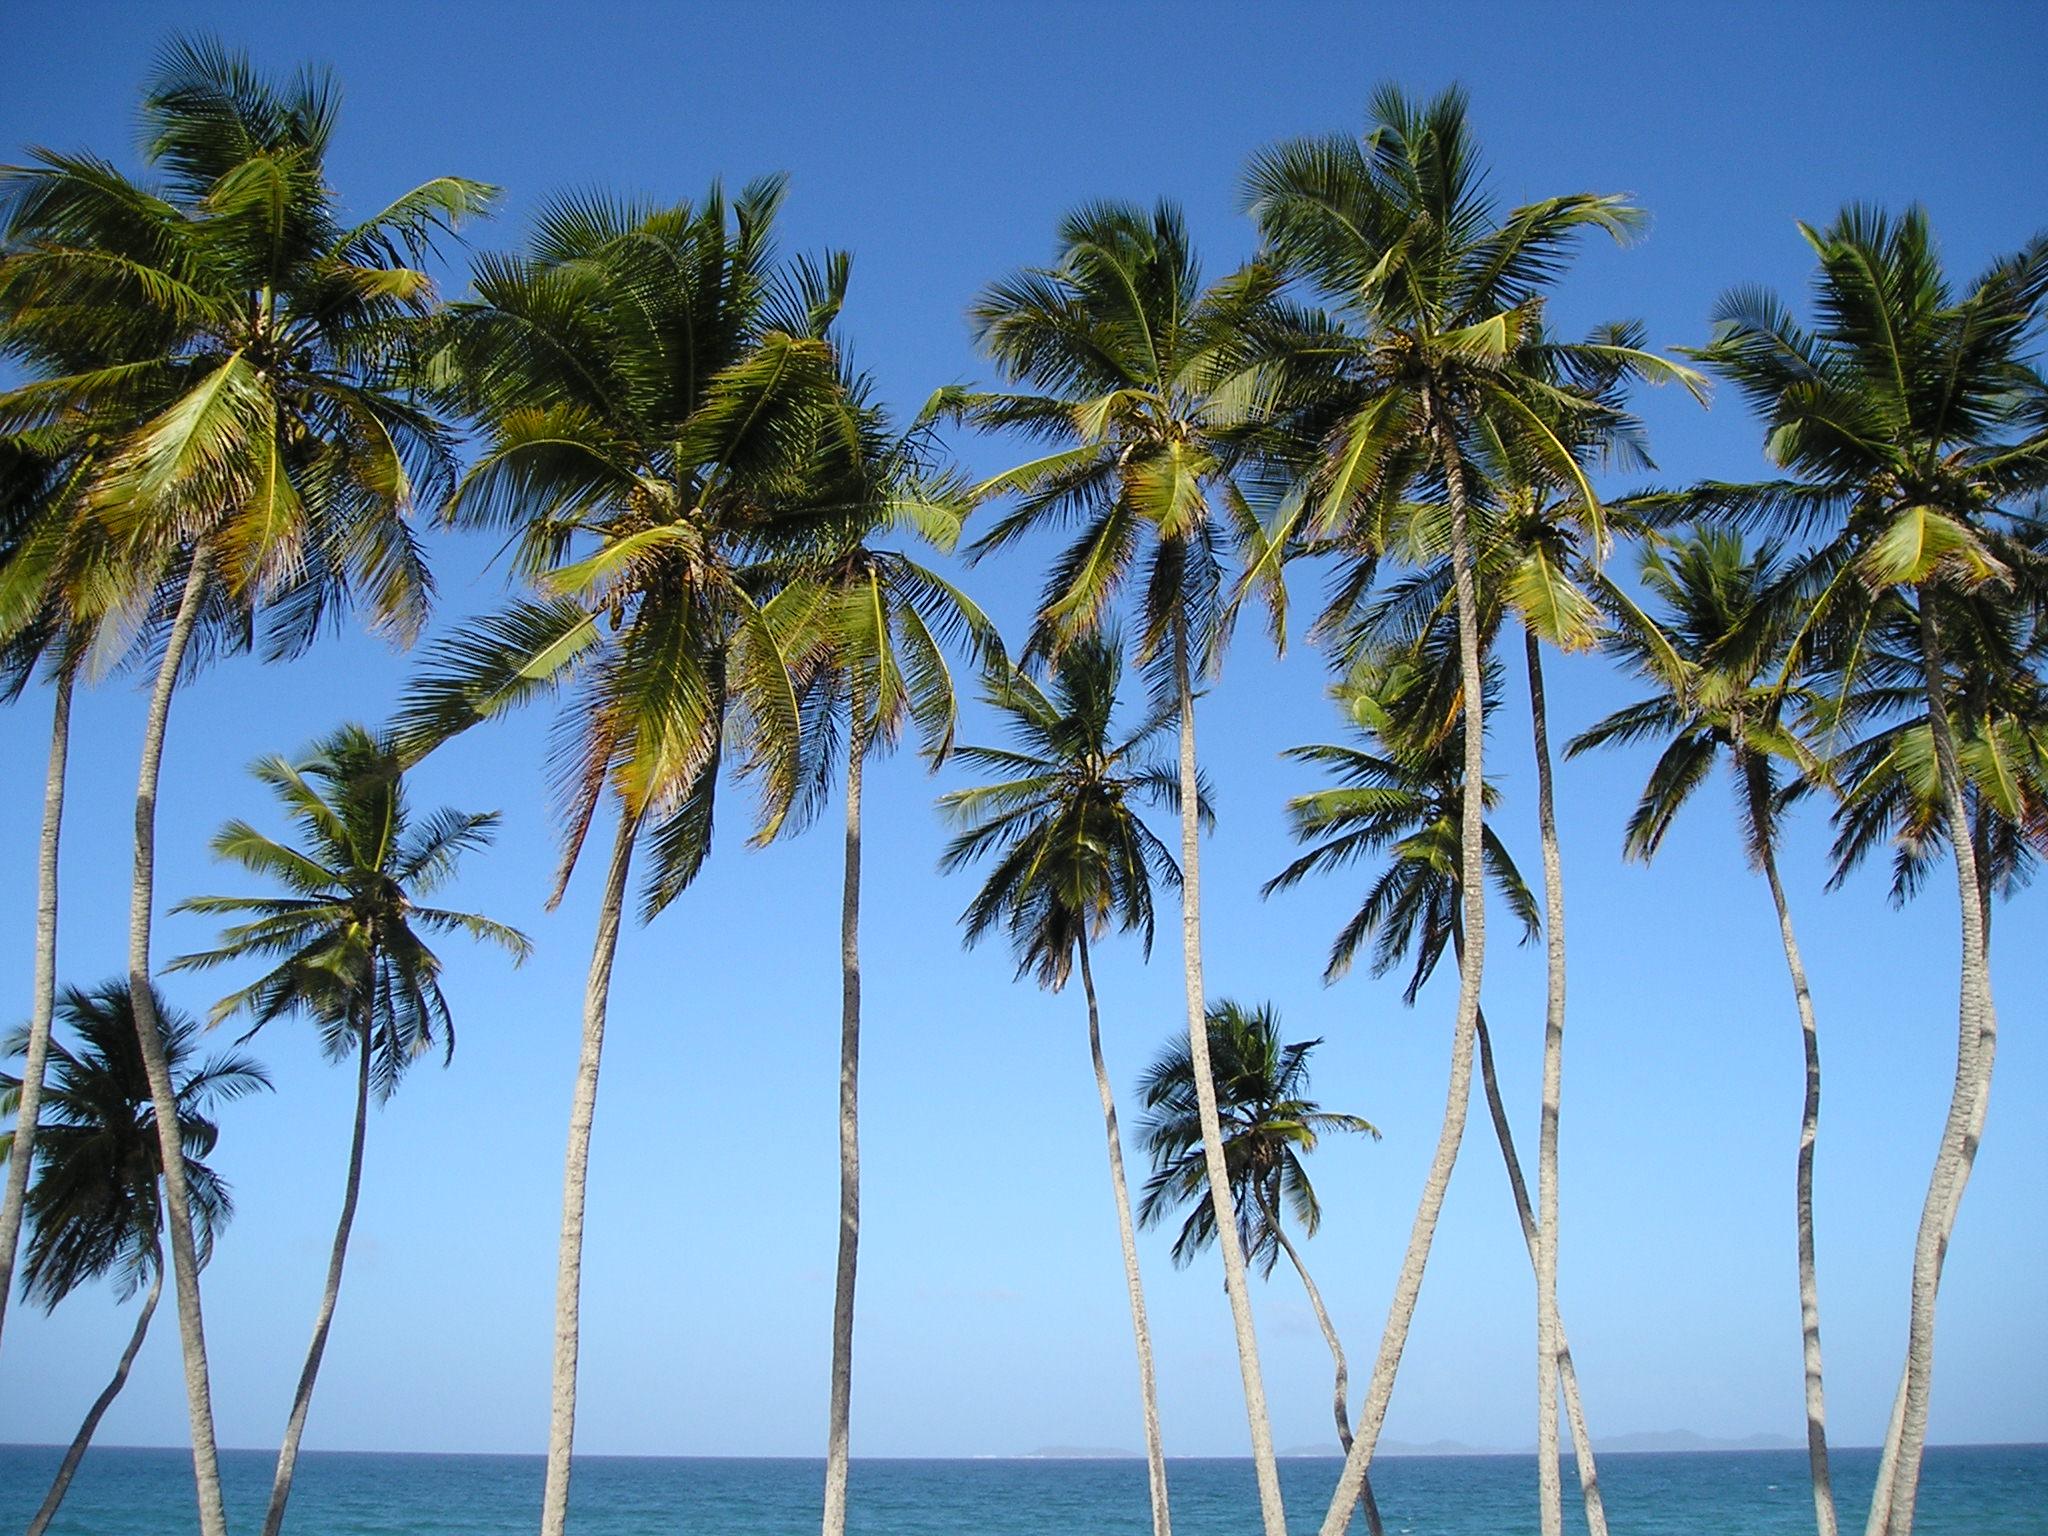 Palmiers de Margarita